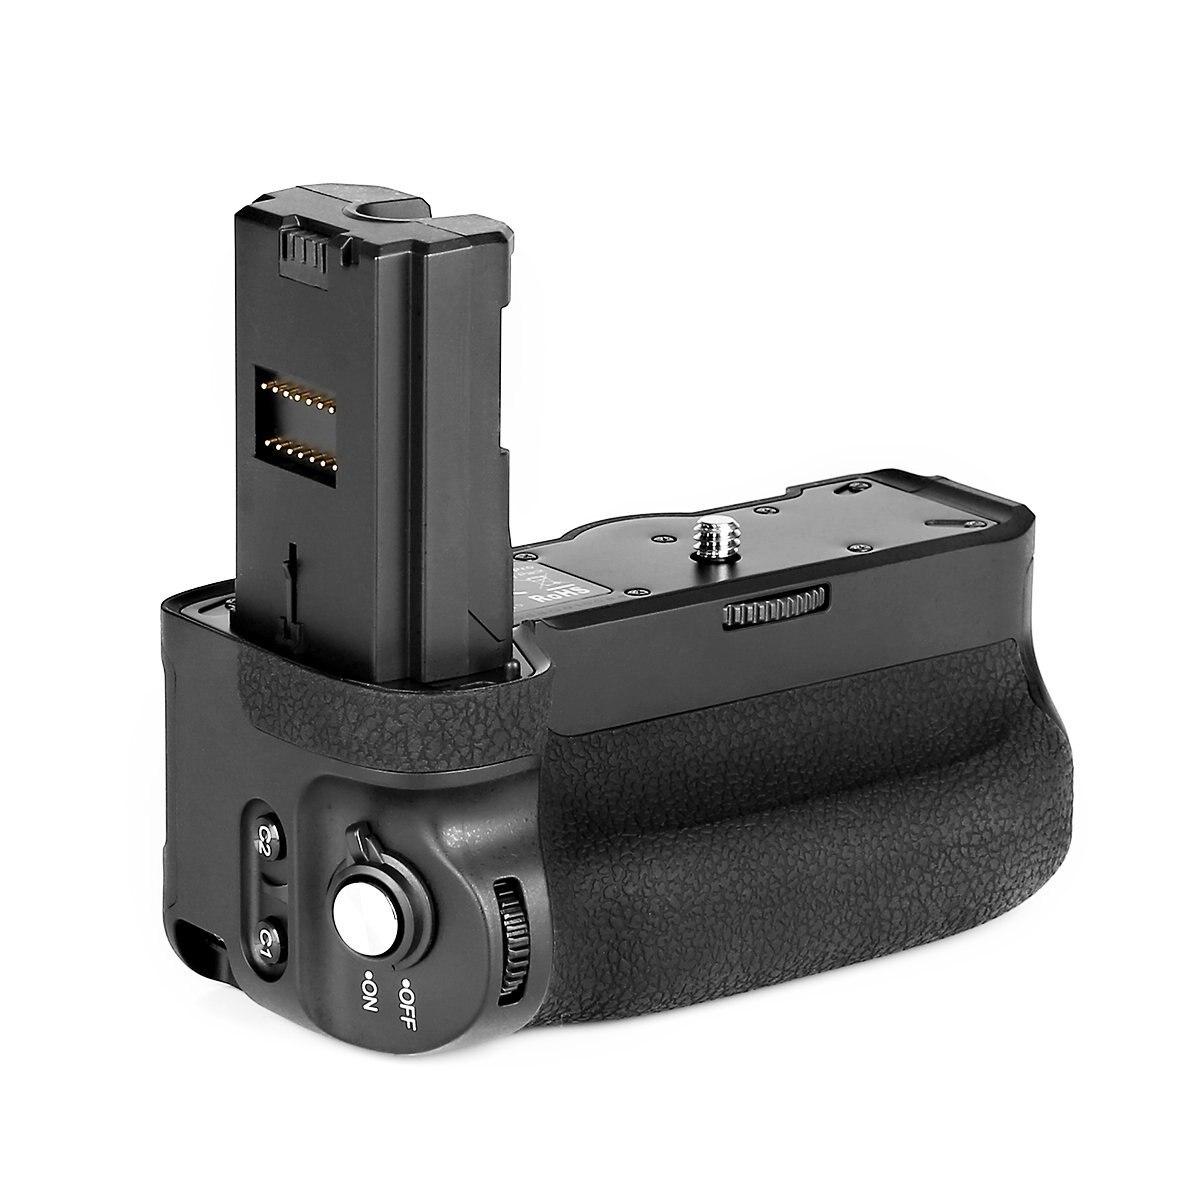 Meike MK-A9 Batterie Grip Control tir Vertical-huées Fsunction pour Sony A9 A7III A73 A7M3 A7RIII A7R3 Caméra